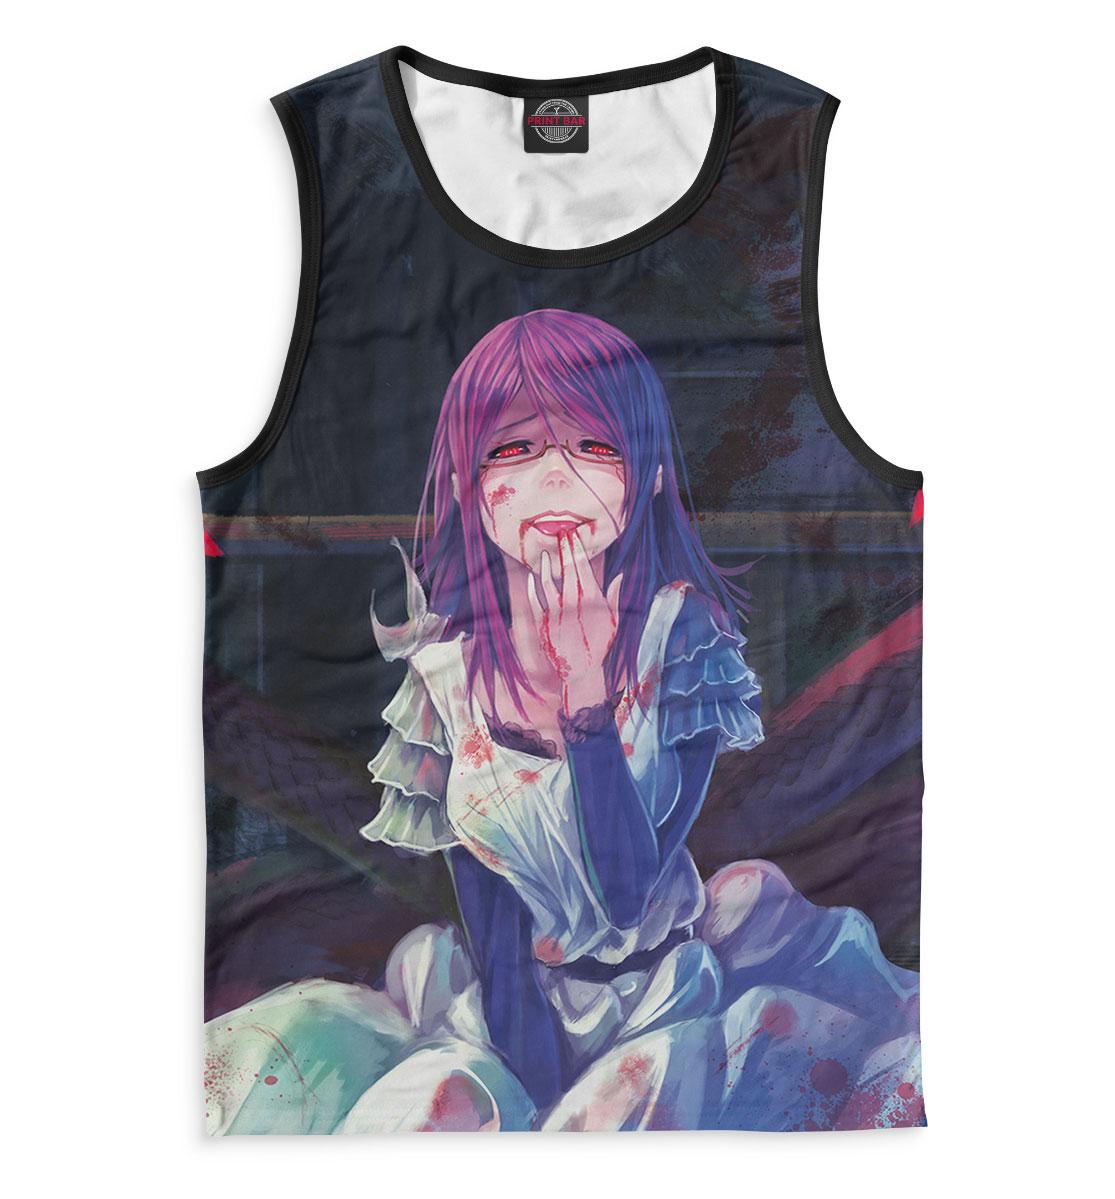 Купить Tokyo Ghoul, Printbar, Майки, TKG-833662-may-2